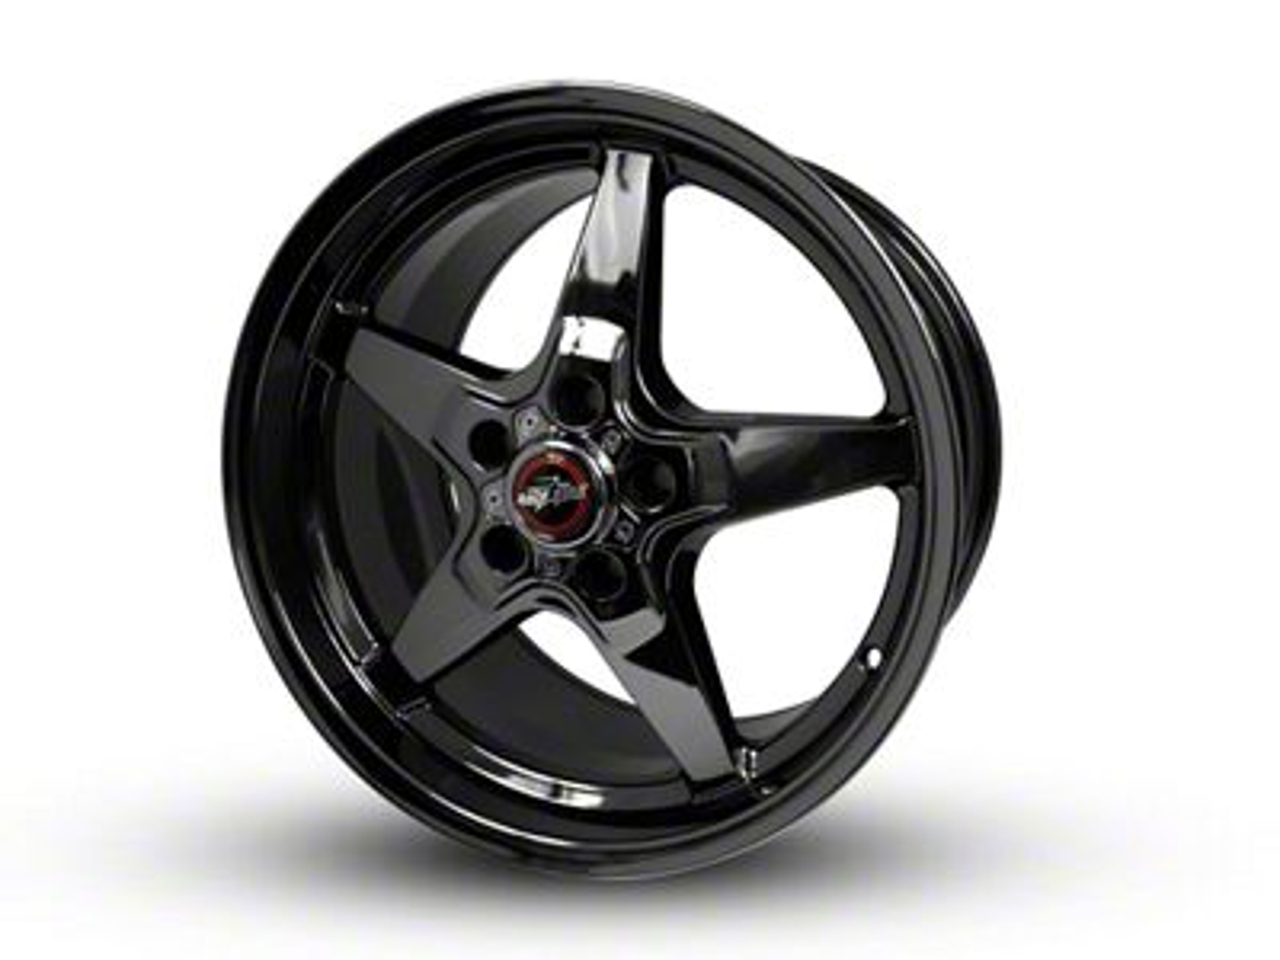 Race Star Dark Star Drag Wheel - 18x10.5 - Rear Only (15-19 GT, EcoBoost, V6)